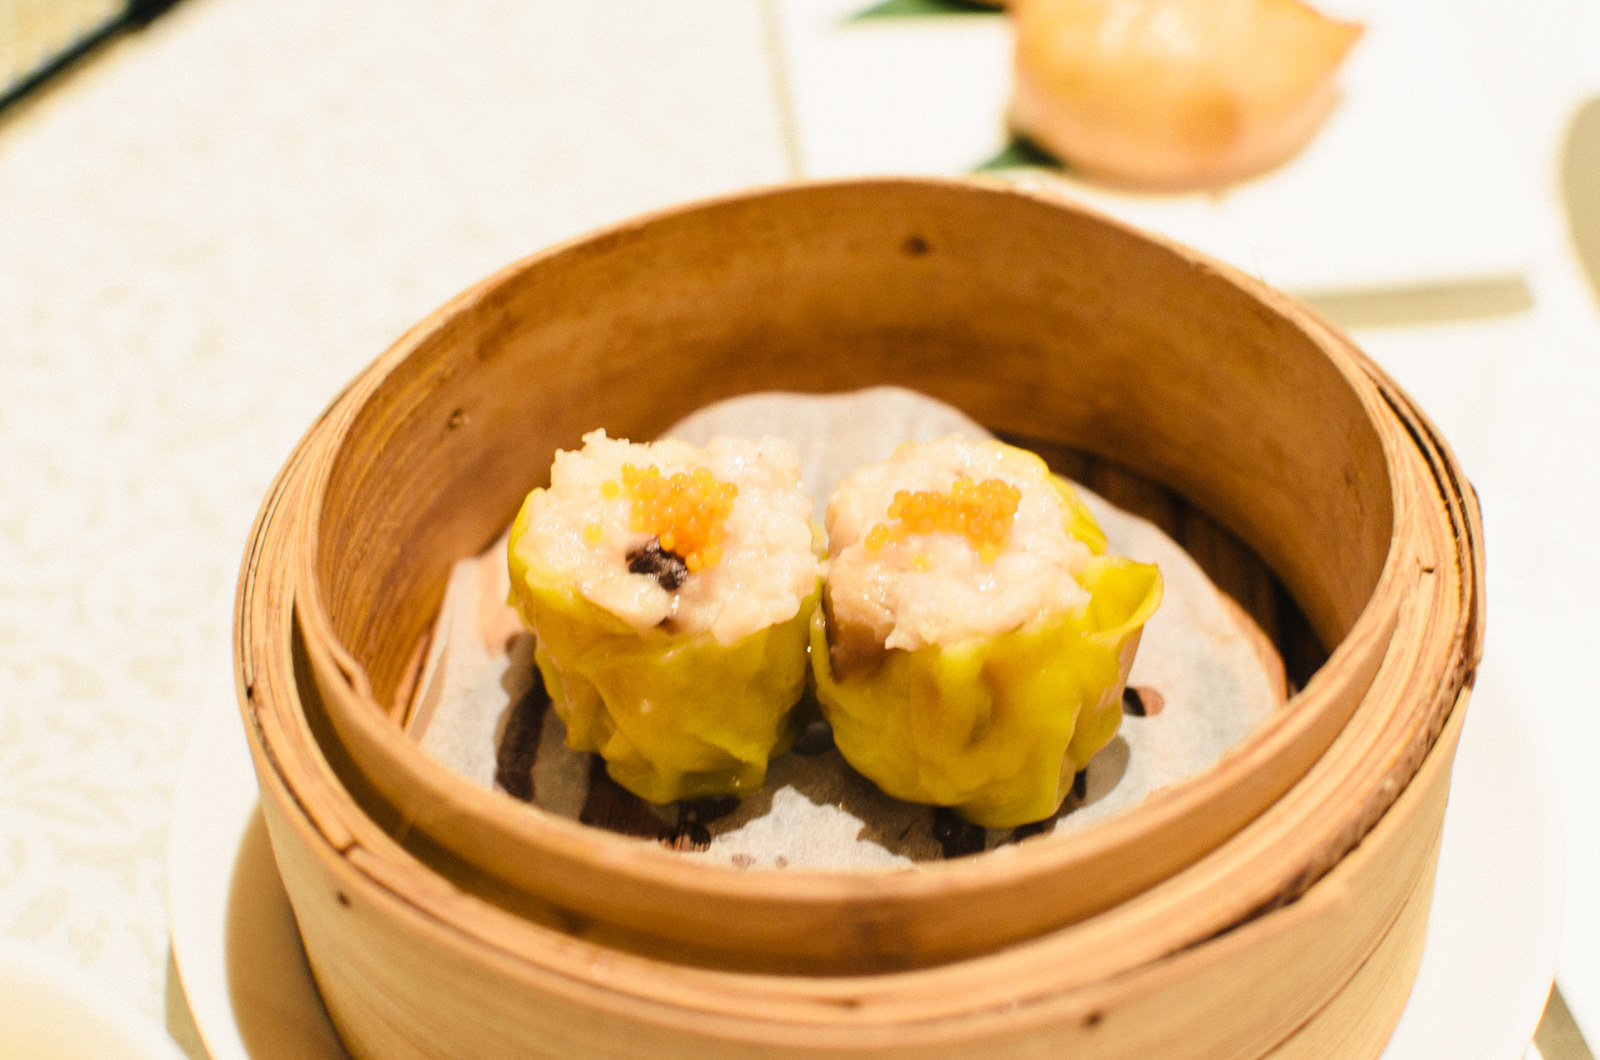 Steamed Pork Dumplings with Fish Roe (鱼子蒸烧卖)